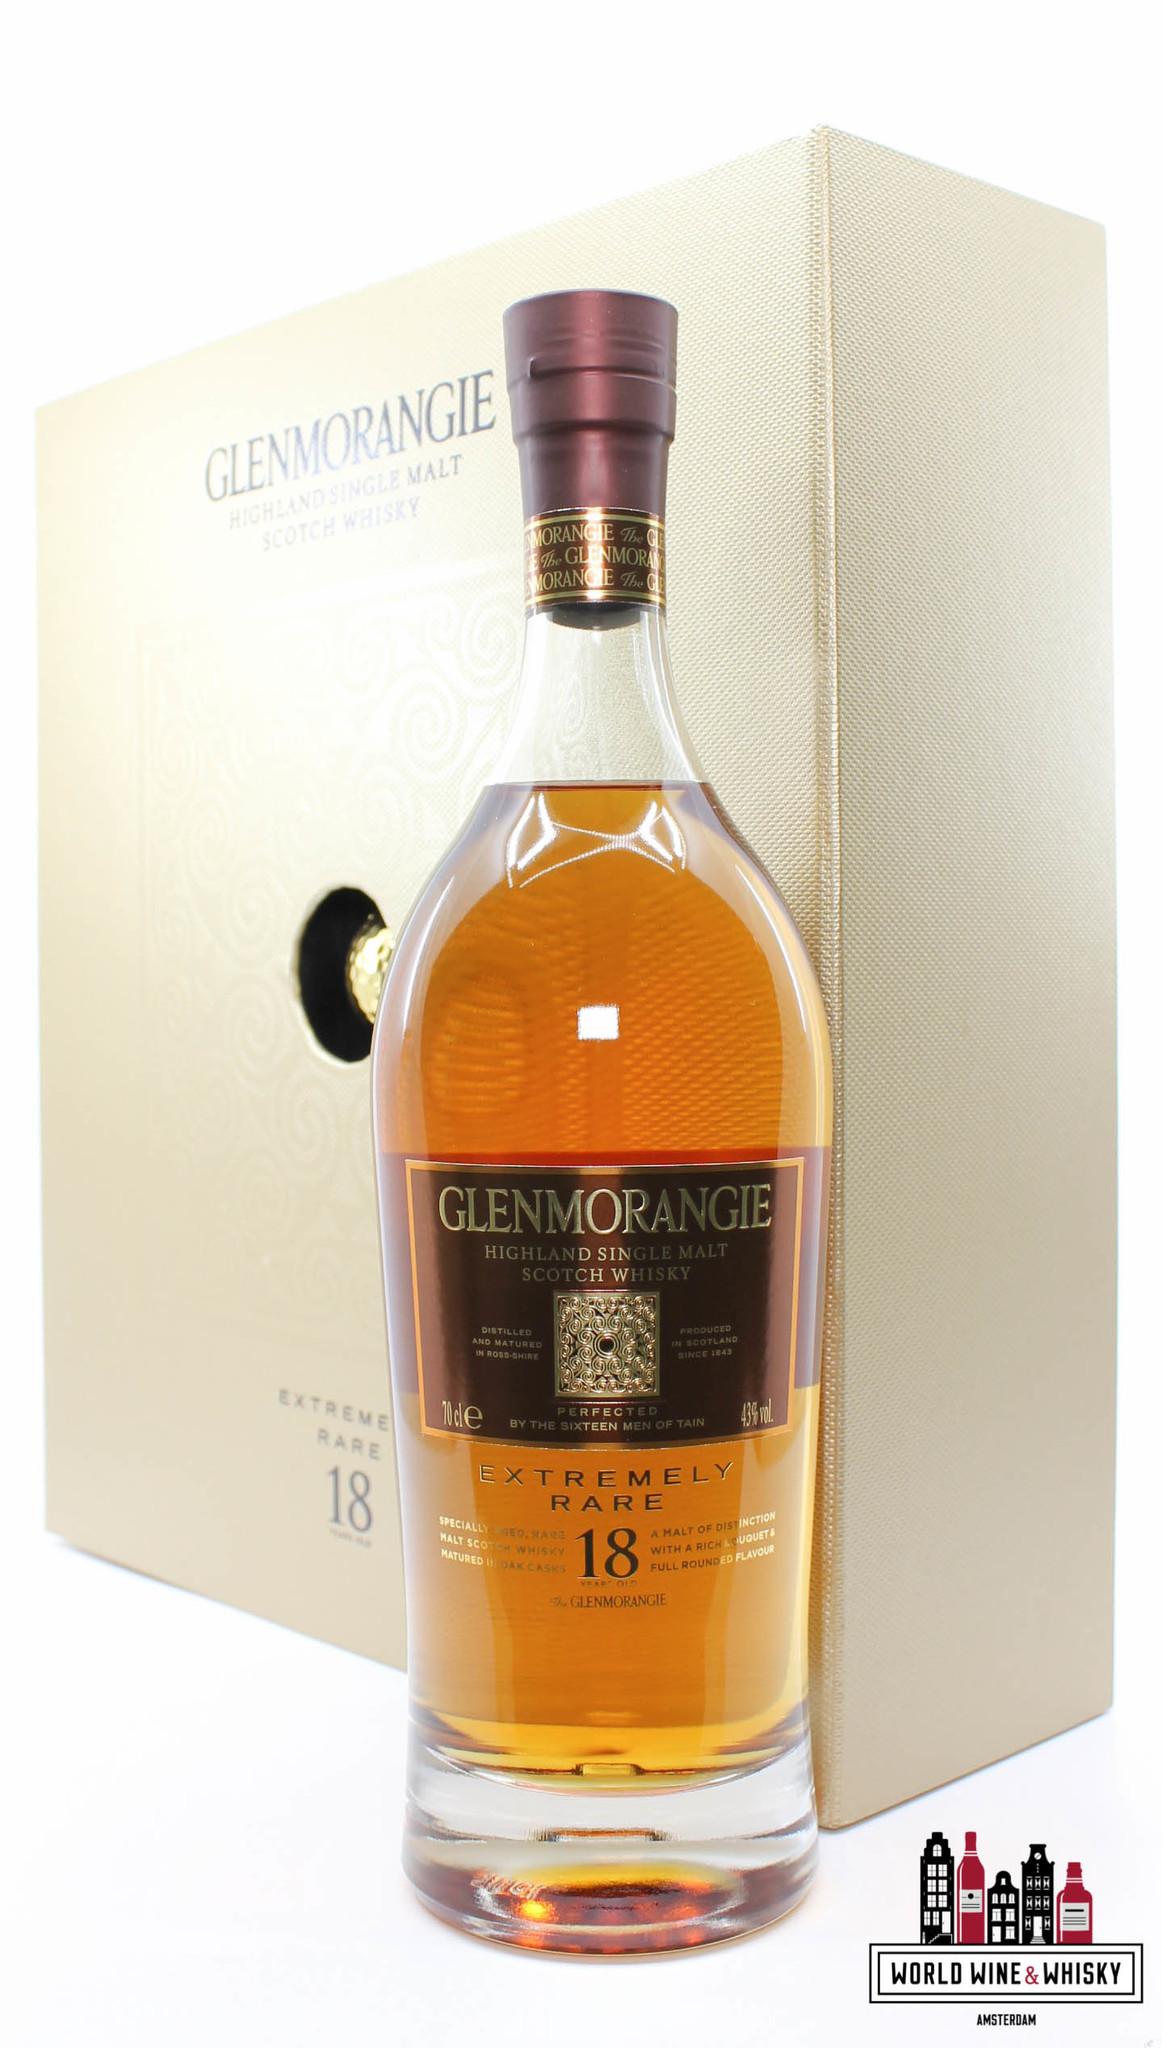 Glenmorangie Glenmorangie 18 Years Old 2013 - Extremely Rare - The Open Muirfield 43% (full set)